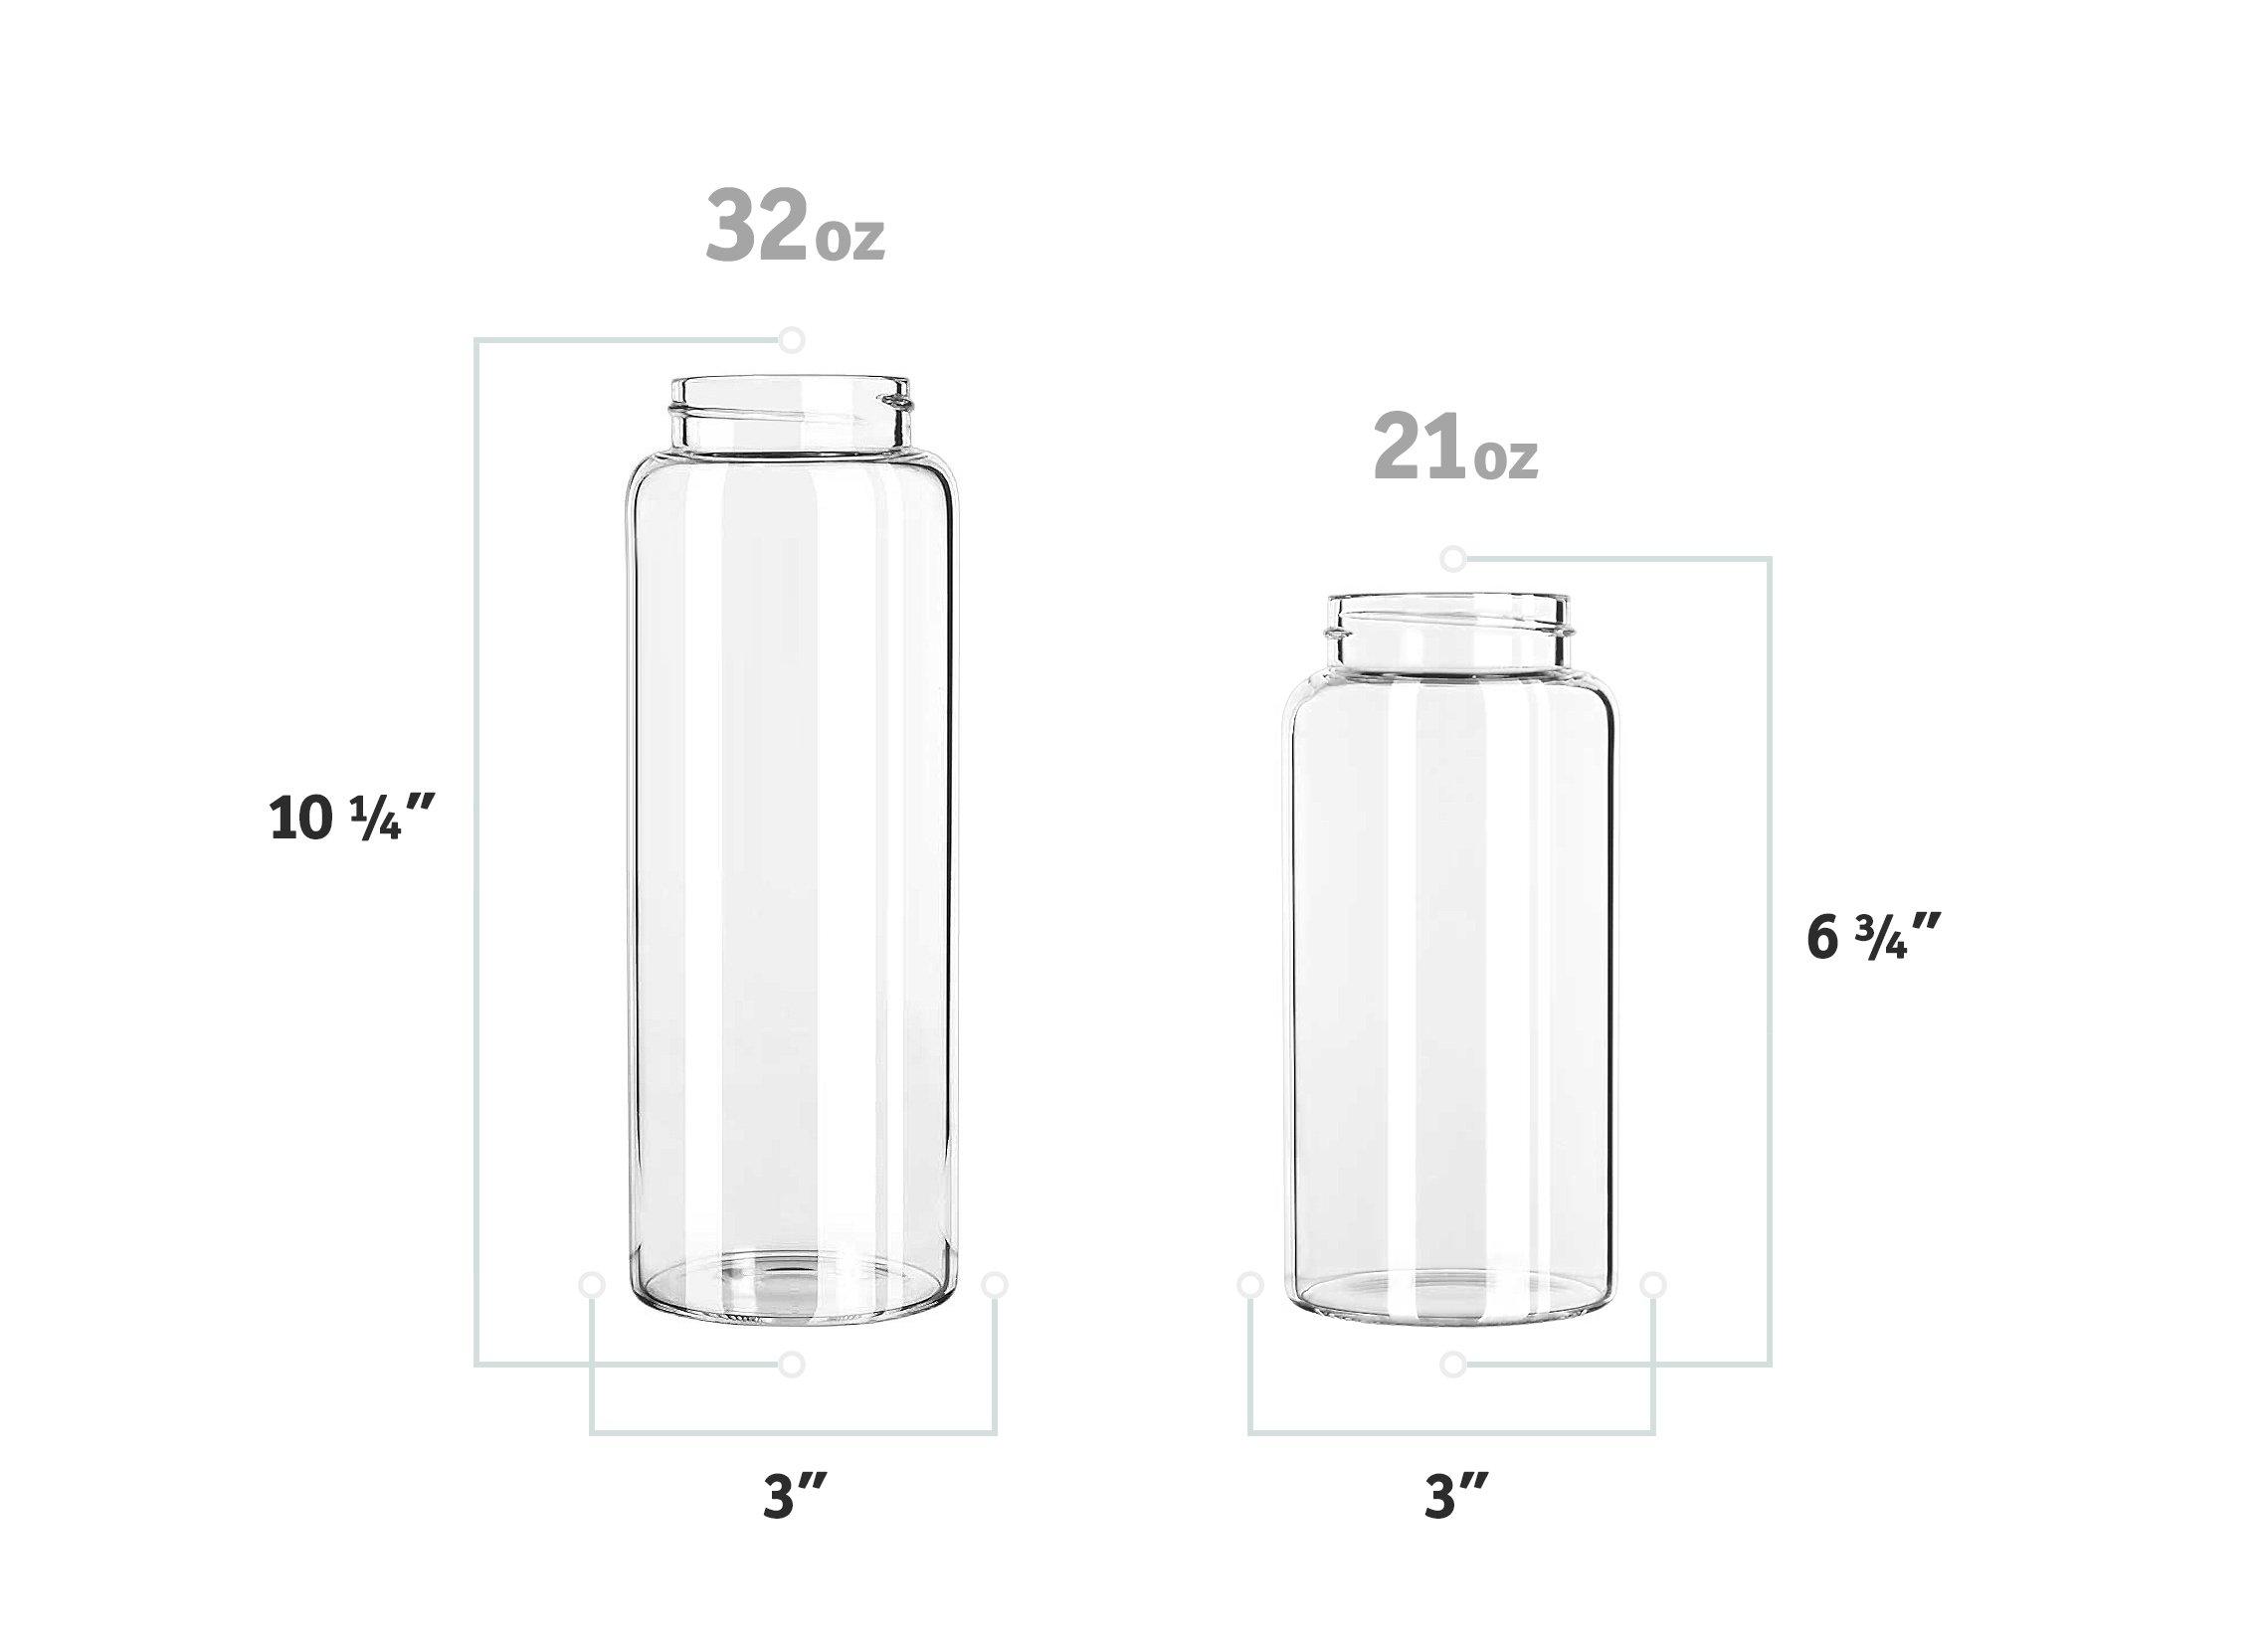 Kablo Glass Water Bottle 32 oz, 100% Borosilicate Glass by Kablo (Image #2)